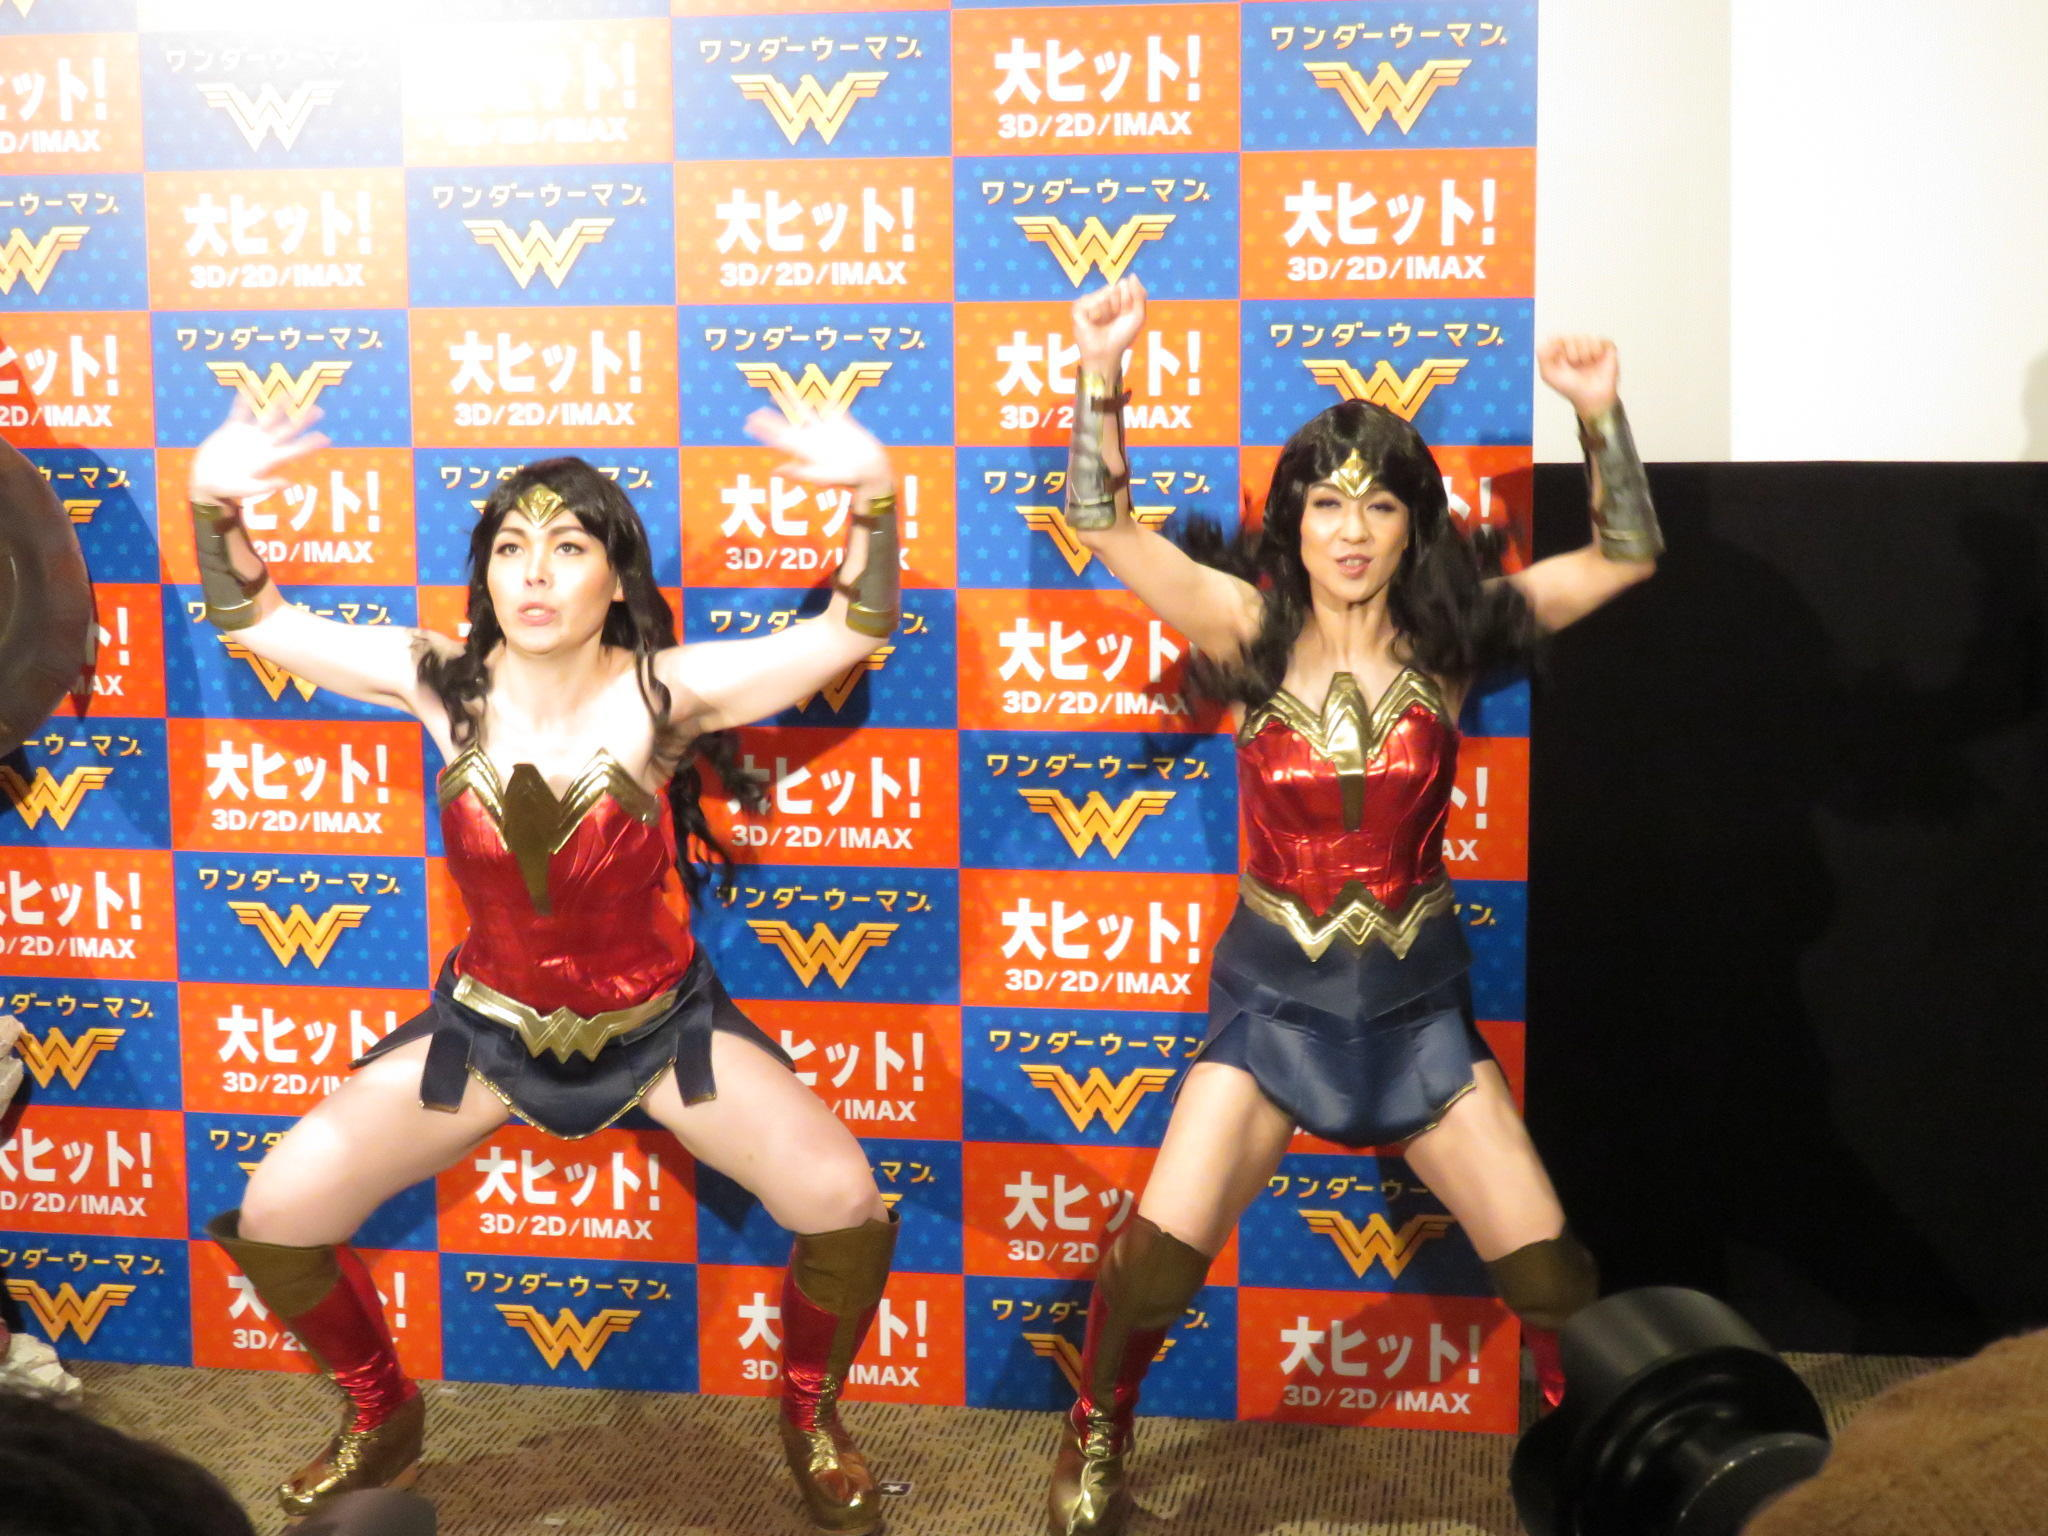 http://news.yoshimoto.co.jp/20170830184002-59c71fb9b57423bbd78a5272550b169d523f3715.jpg